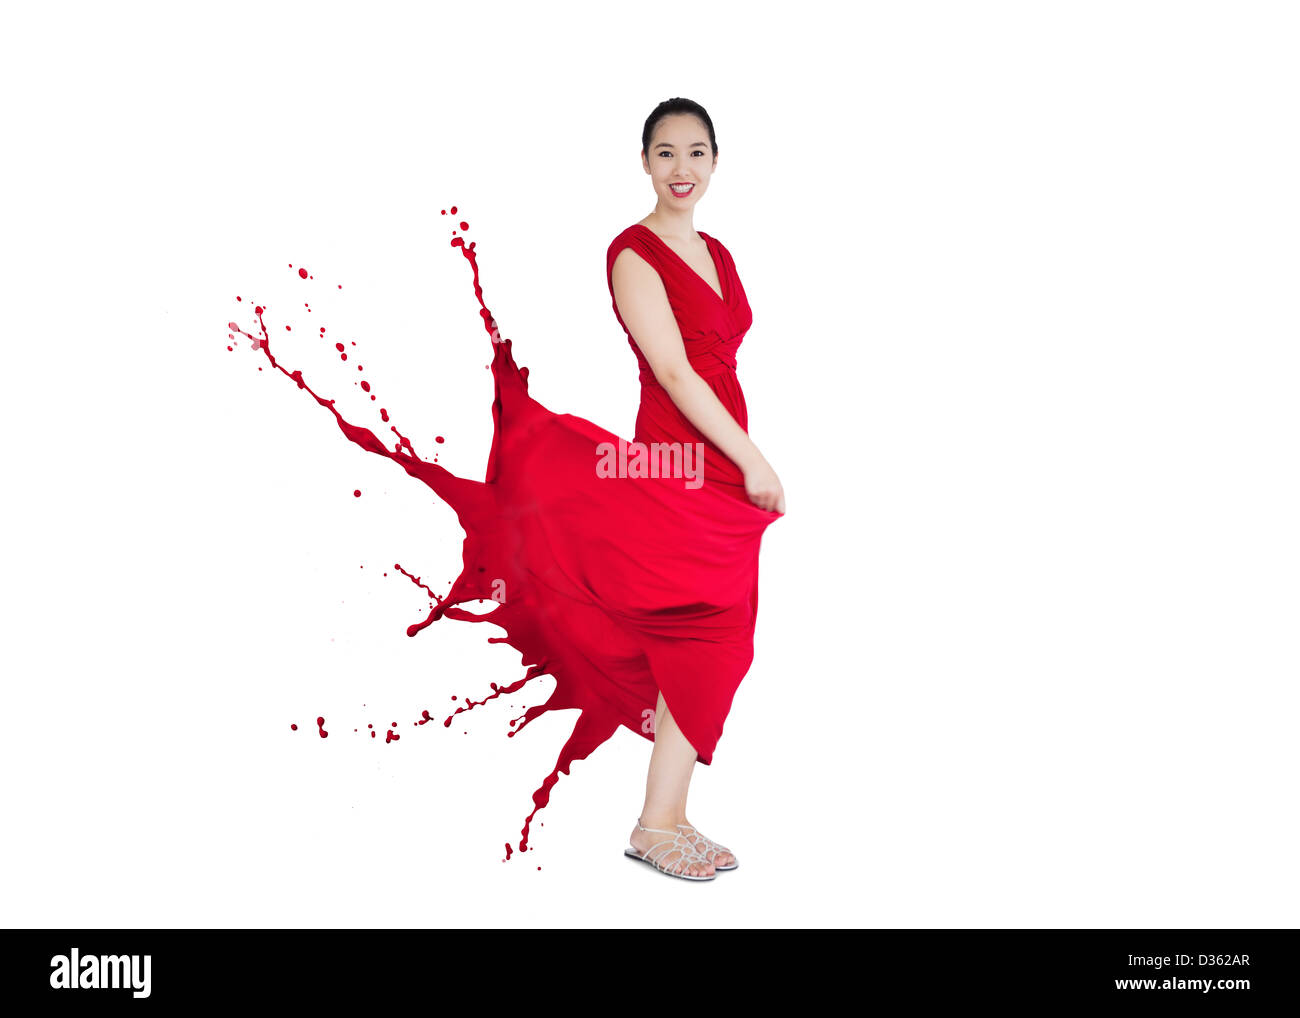 red paint splatter stock photos & red paint splatter stock images